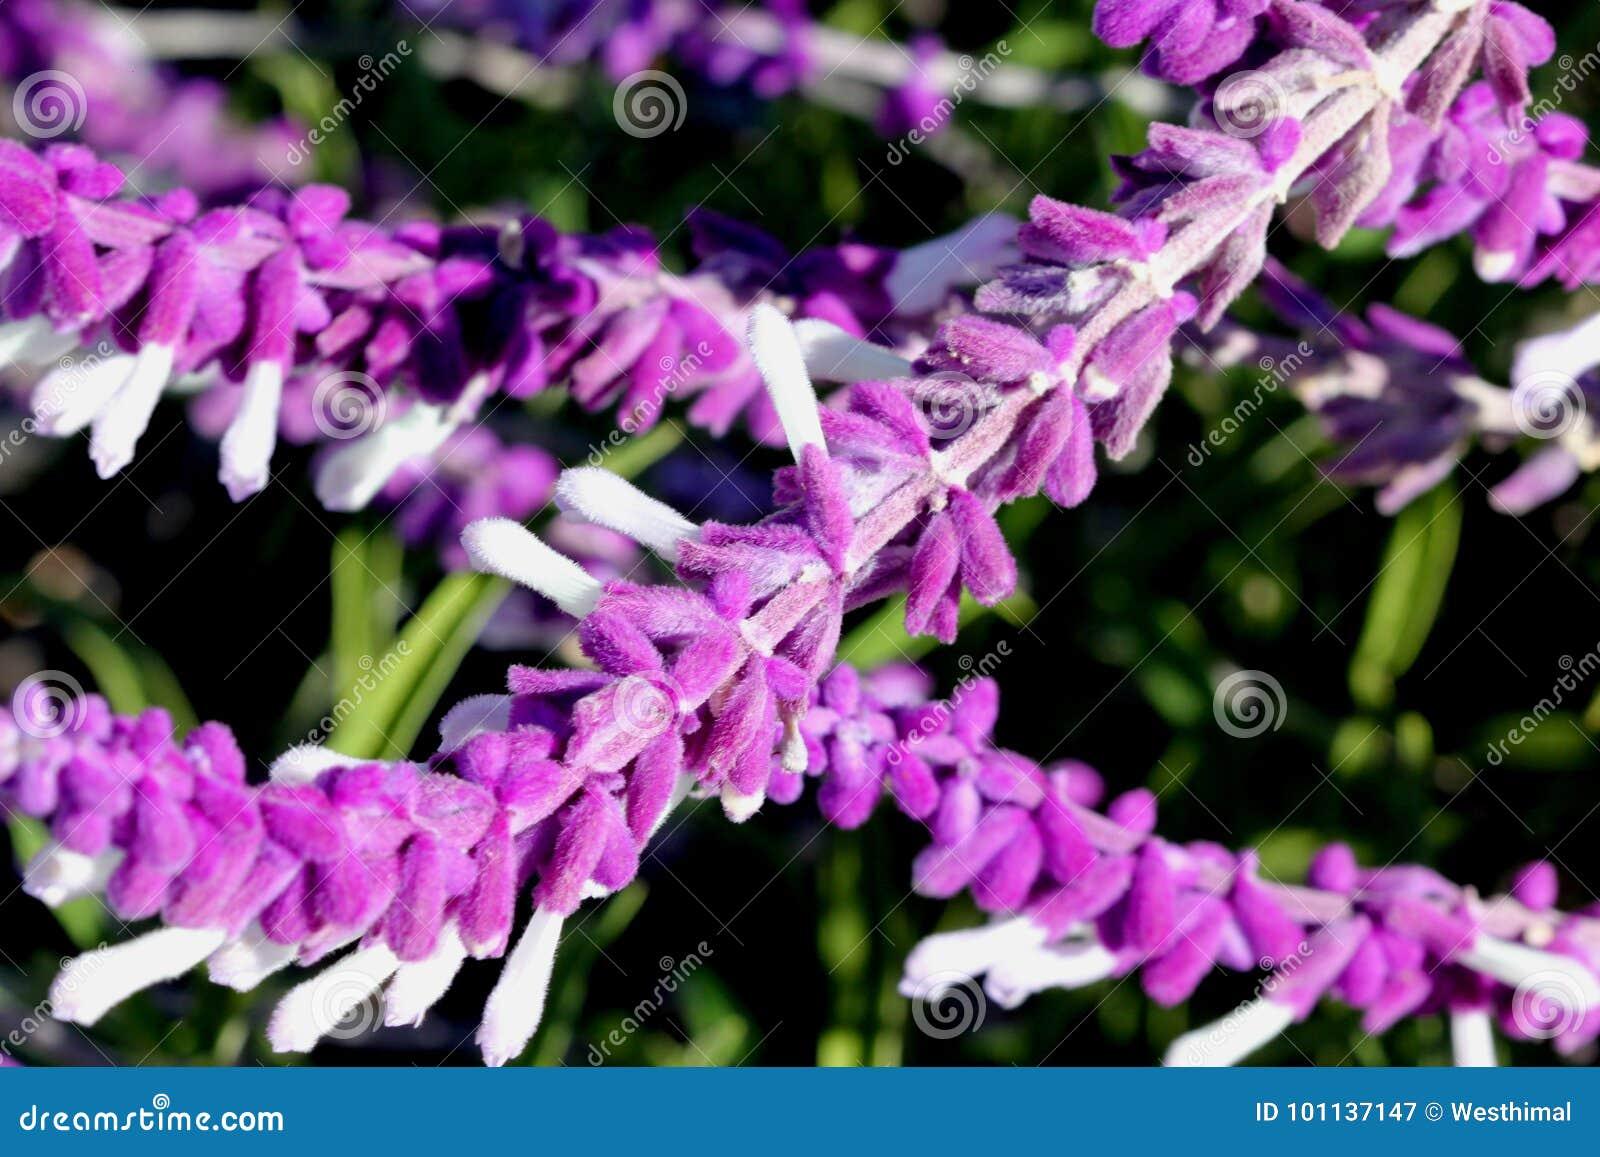 Salvia leucantha, Mexican Sage, Velvet Sage